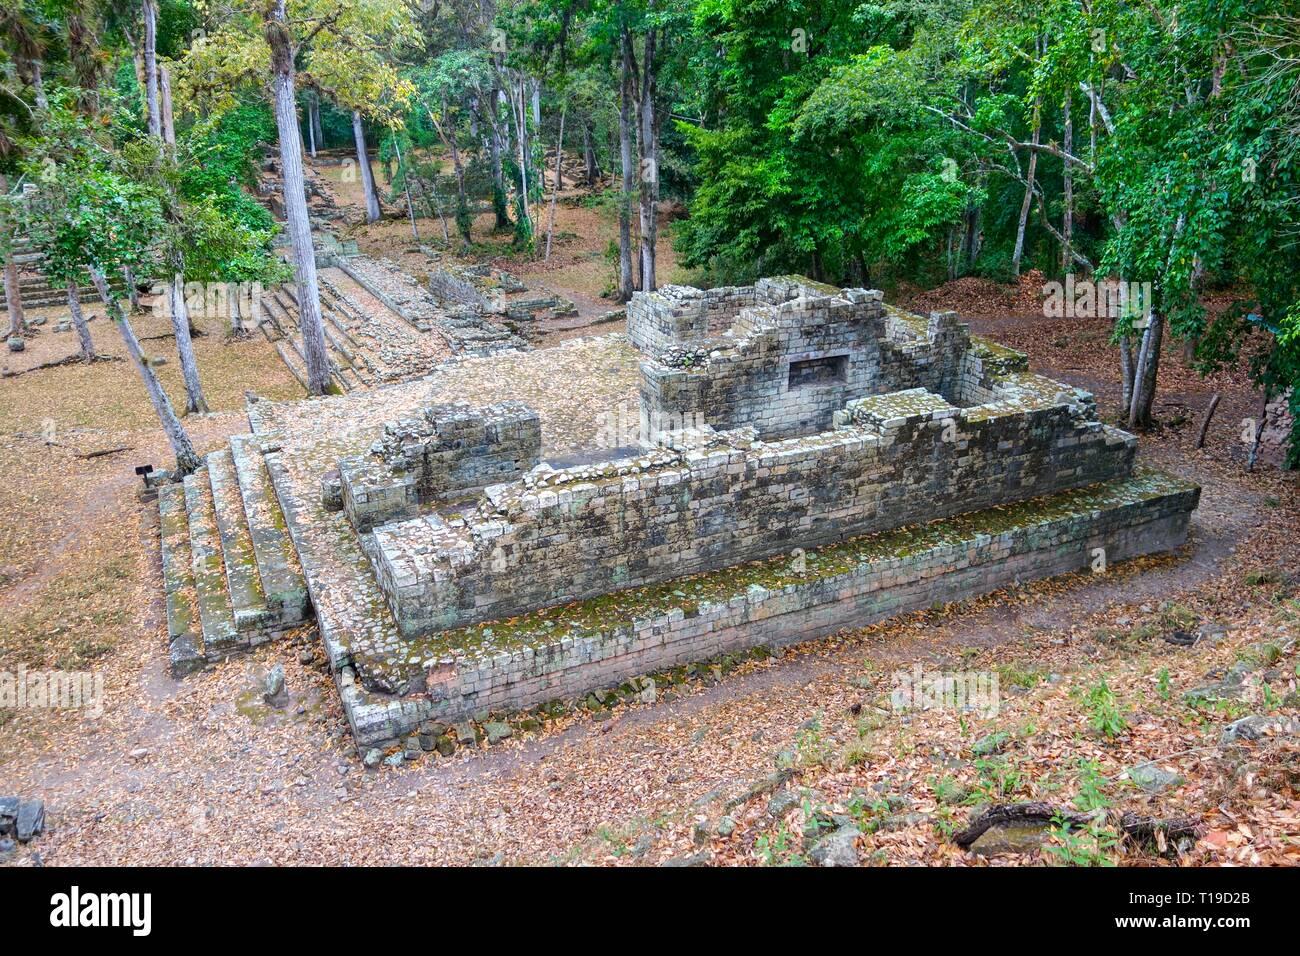 World Famous Copan Ruins Archeological Site of ancient Maya Civilization, a UNESCO World Heritage Site in Honduras near Guatemala Border - Stock Image